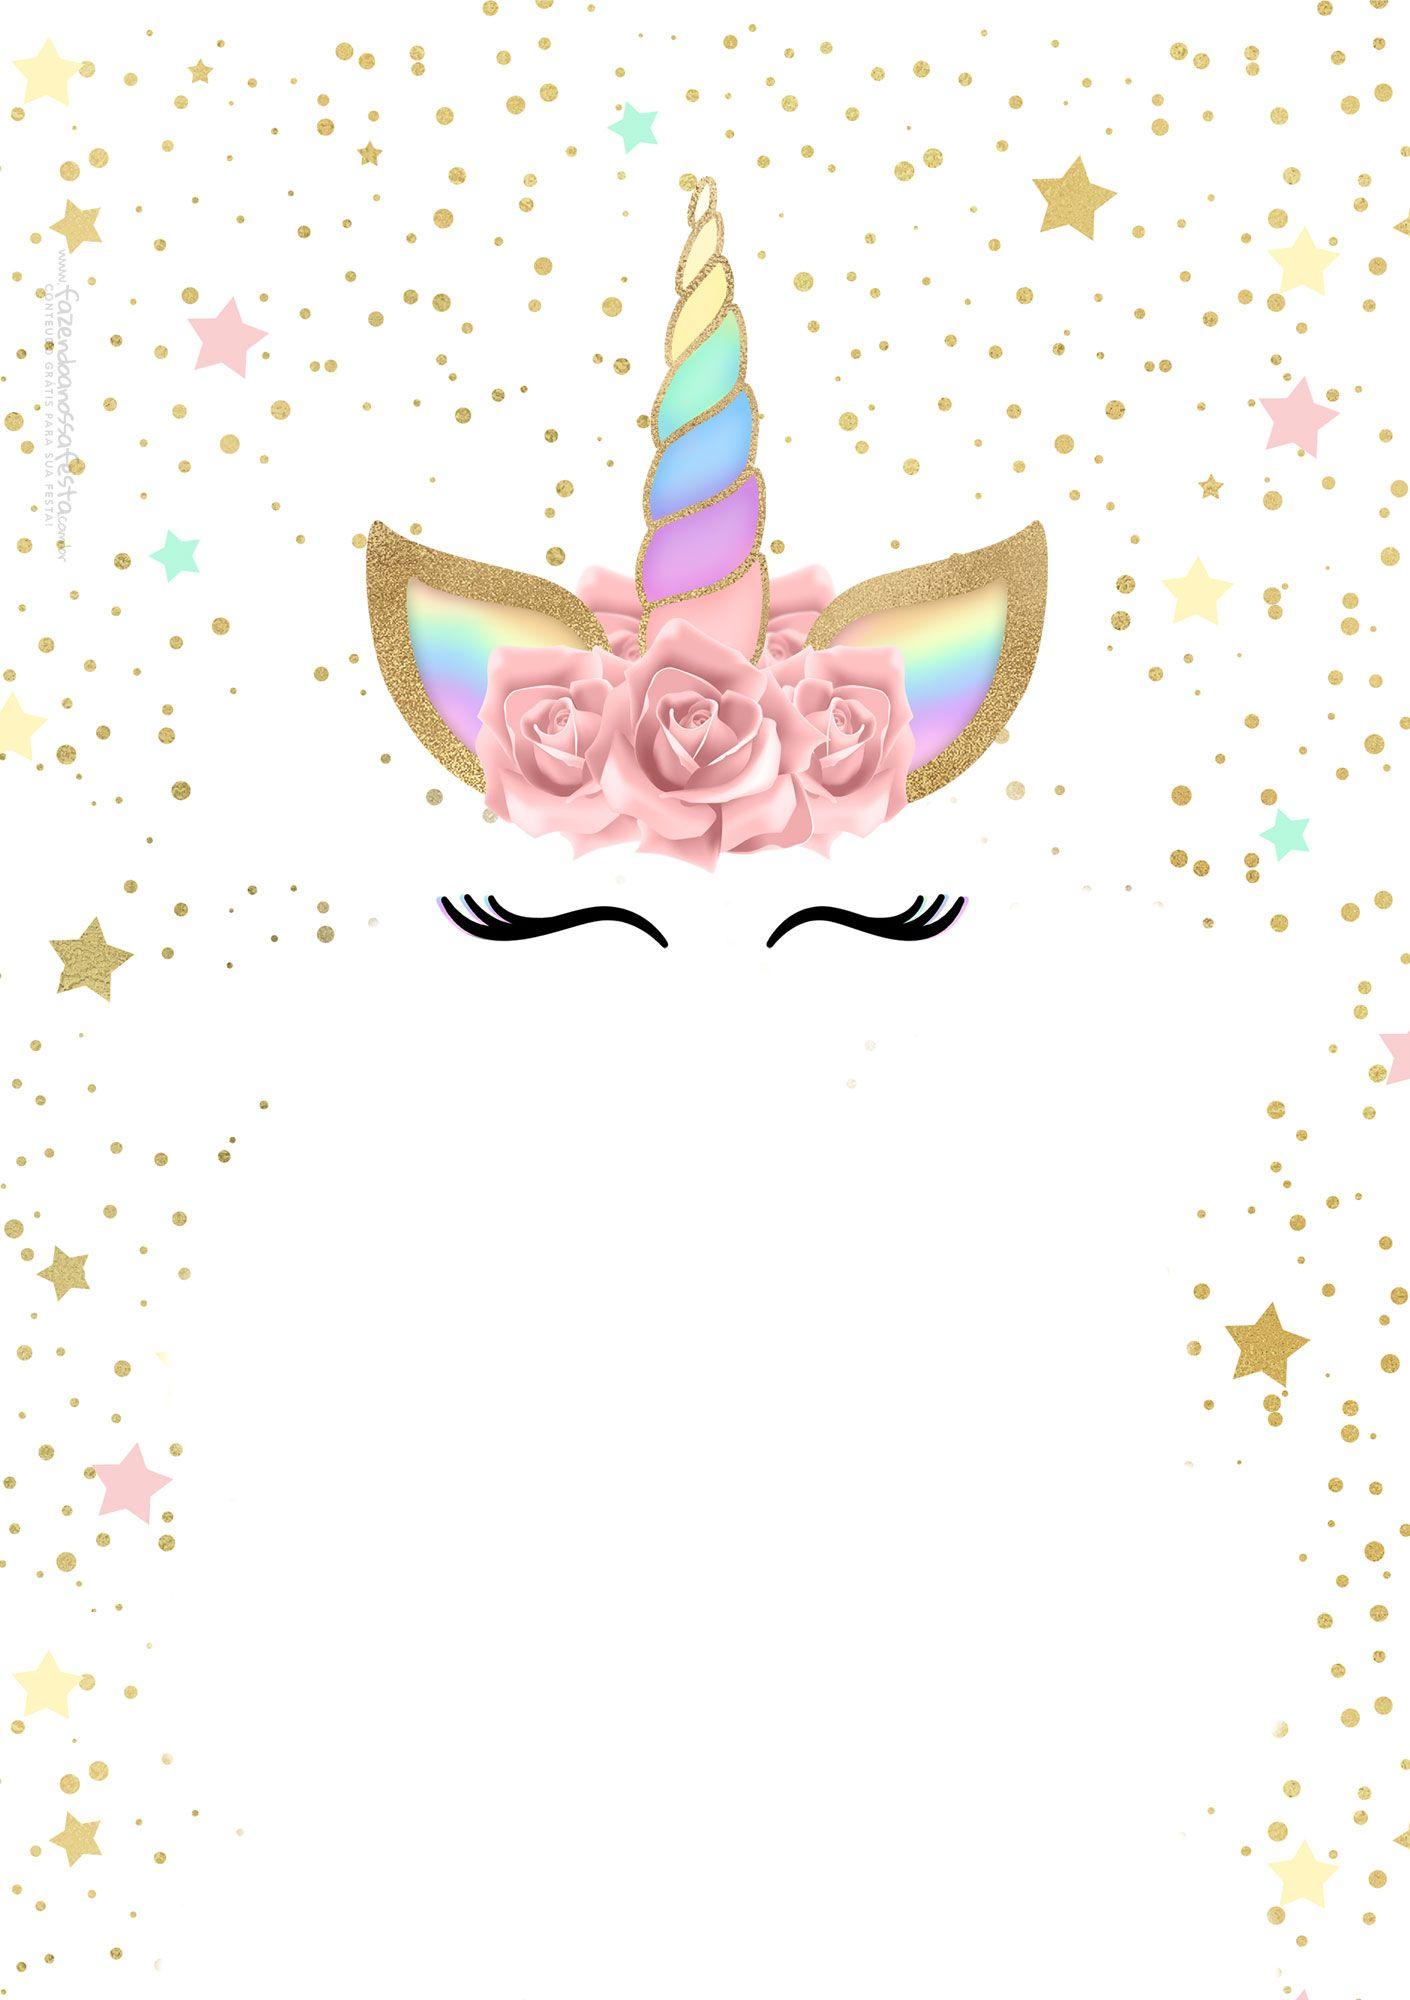 Convite-Unicornio-Gratis.jpg 1,410×2,000 pixeles | Unicorns ...